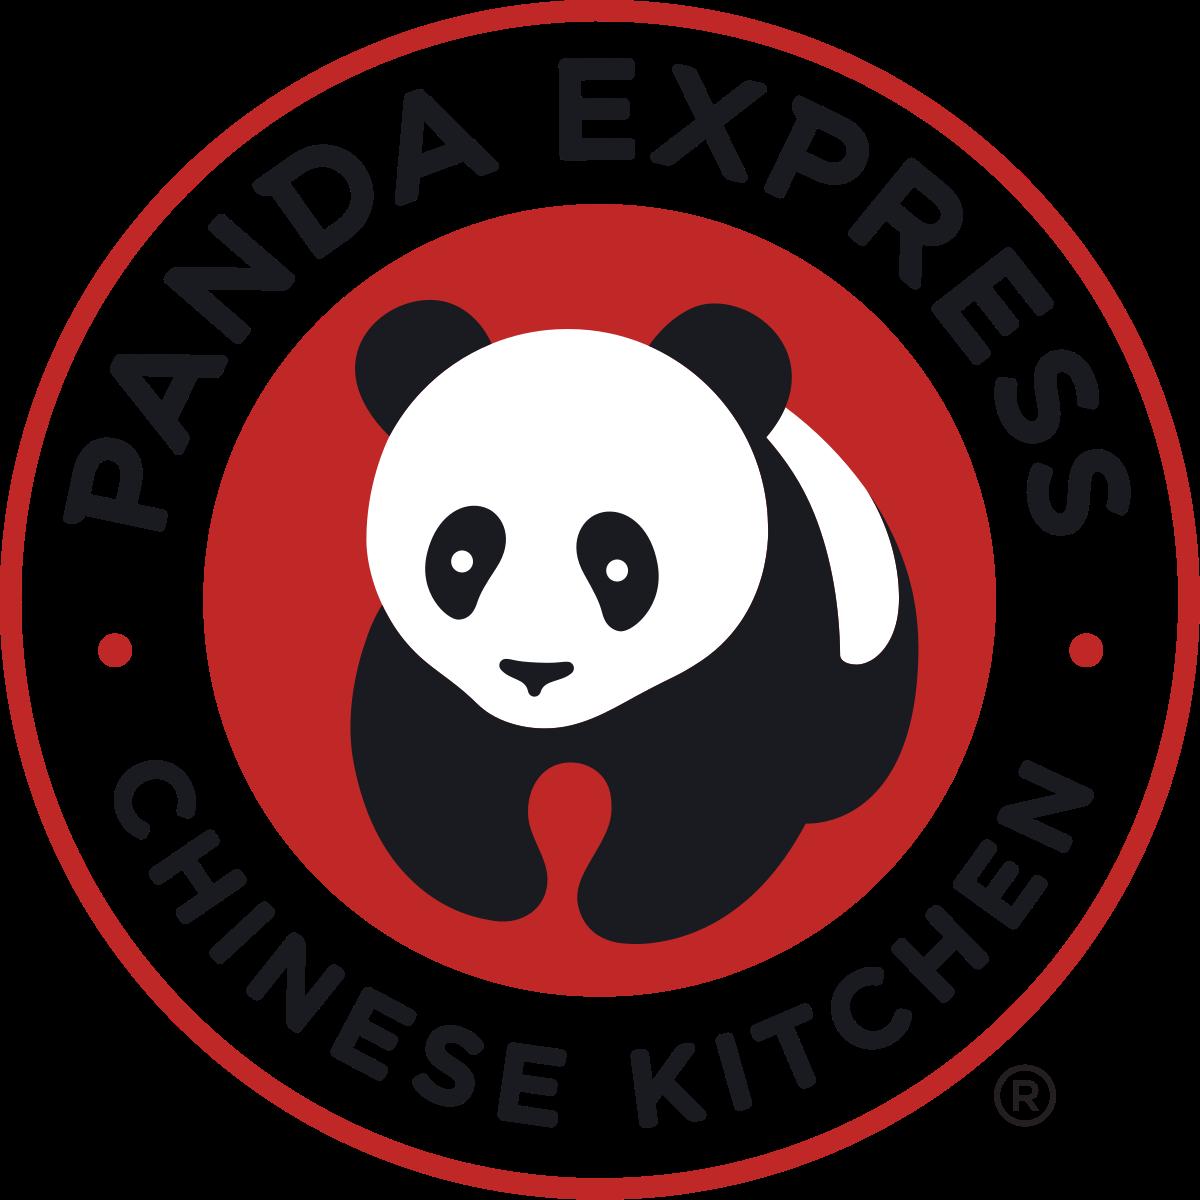 Panda Express.